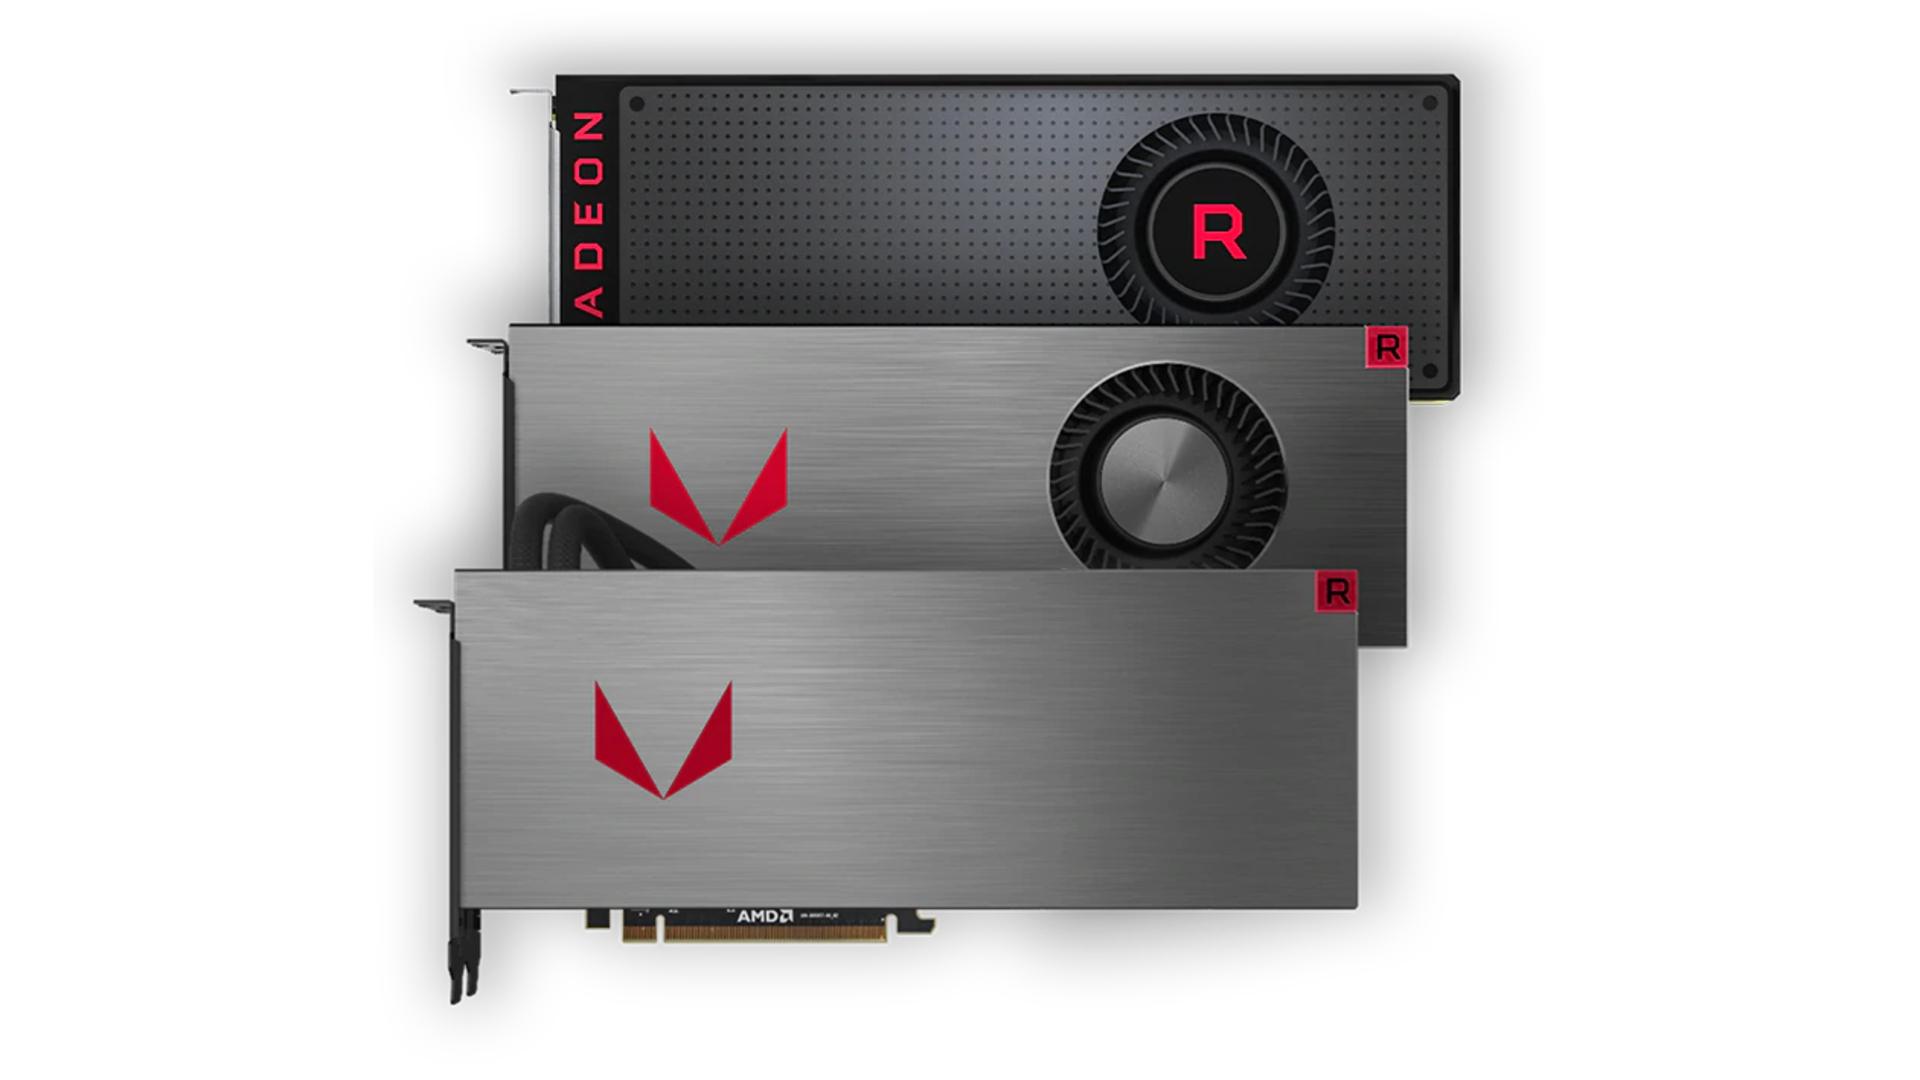 AMD Radeon RX Vega series GPUs on a white background